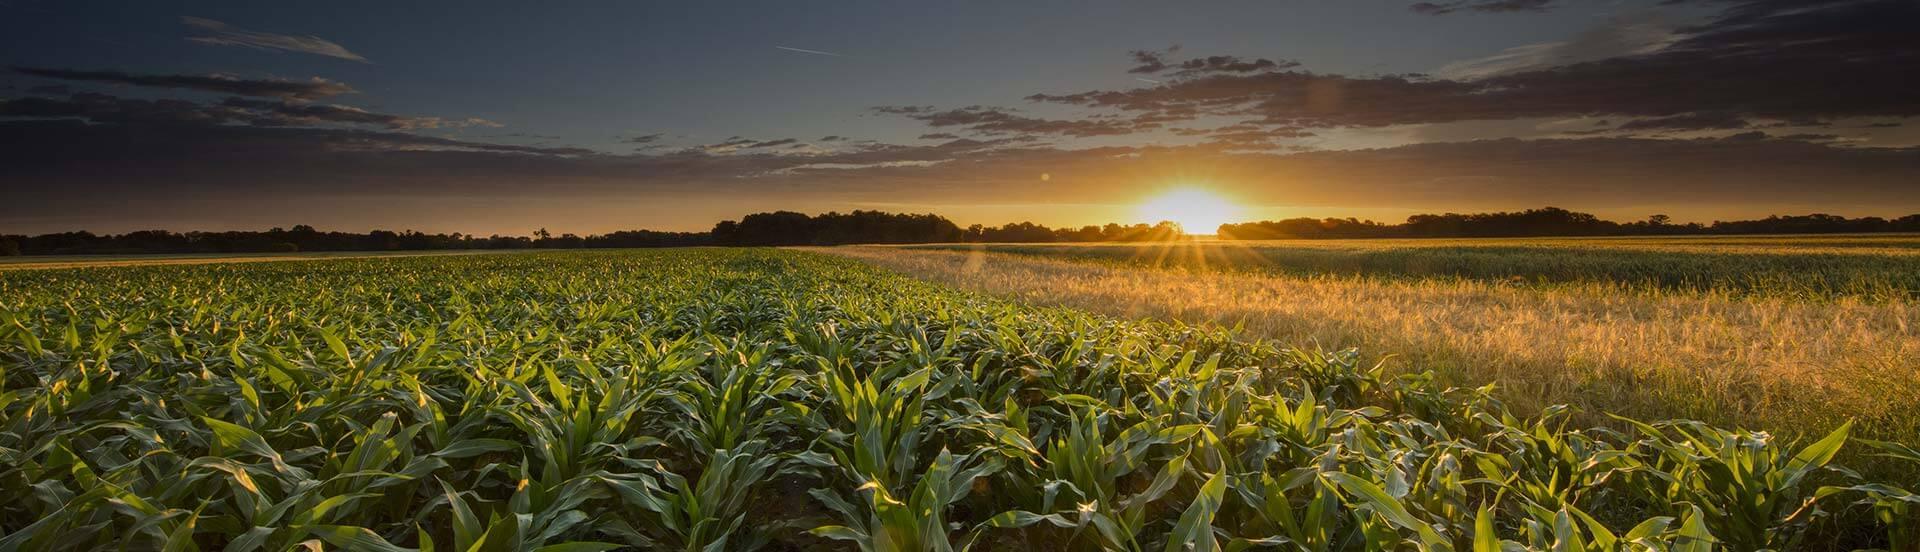 Materiał siewny kukurydza